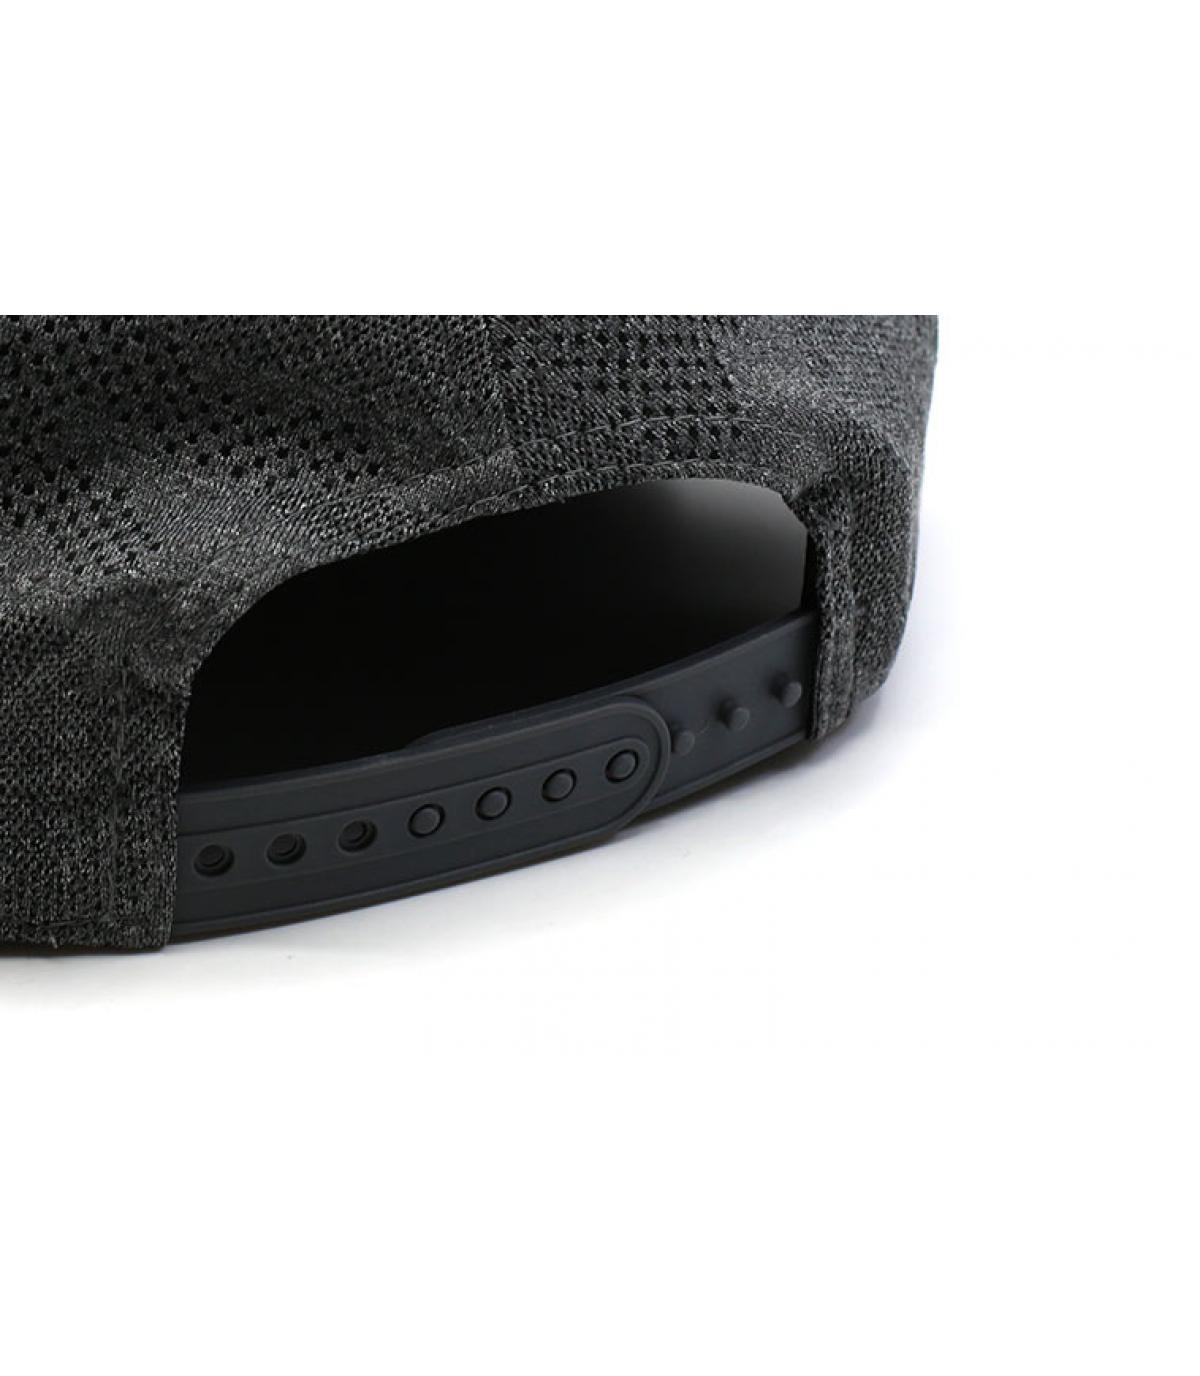 Detalles Engineered Plus NY 950 gray black imagen 5